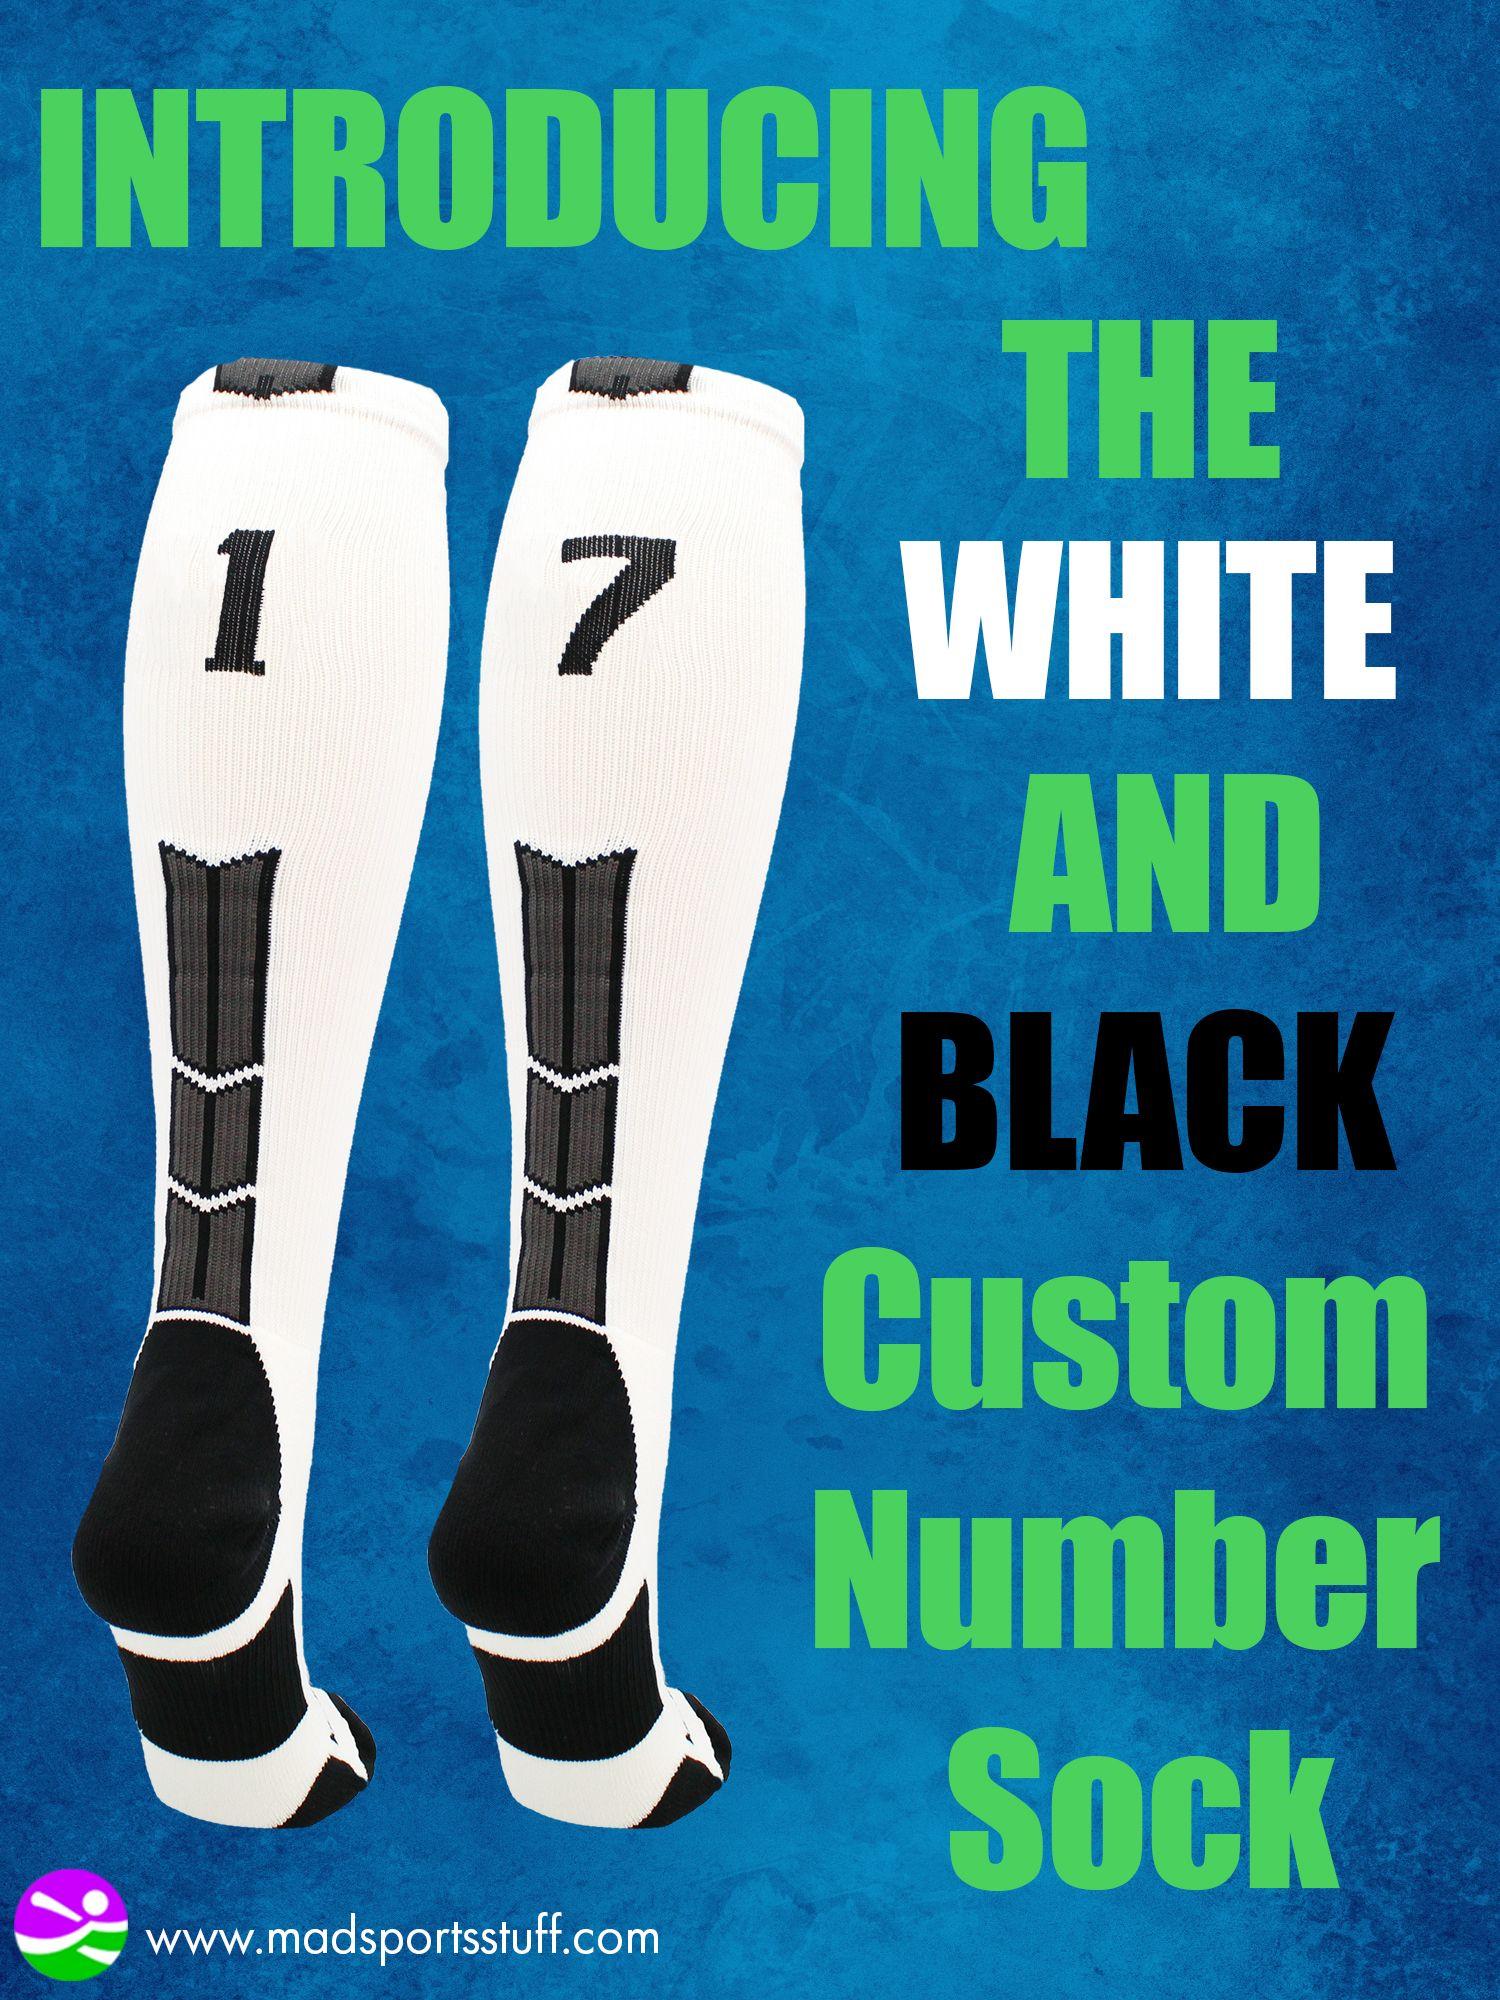 Player Id Jersey Number Socks Over The Calf Length White And Black In 2020 Socks Custom Sports Socks Softball Socks